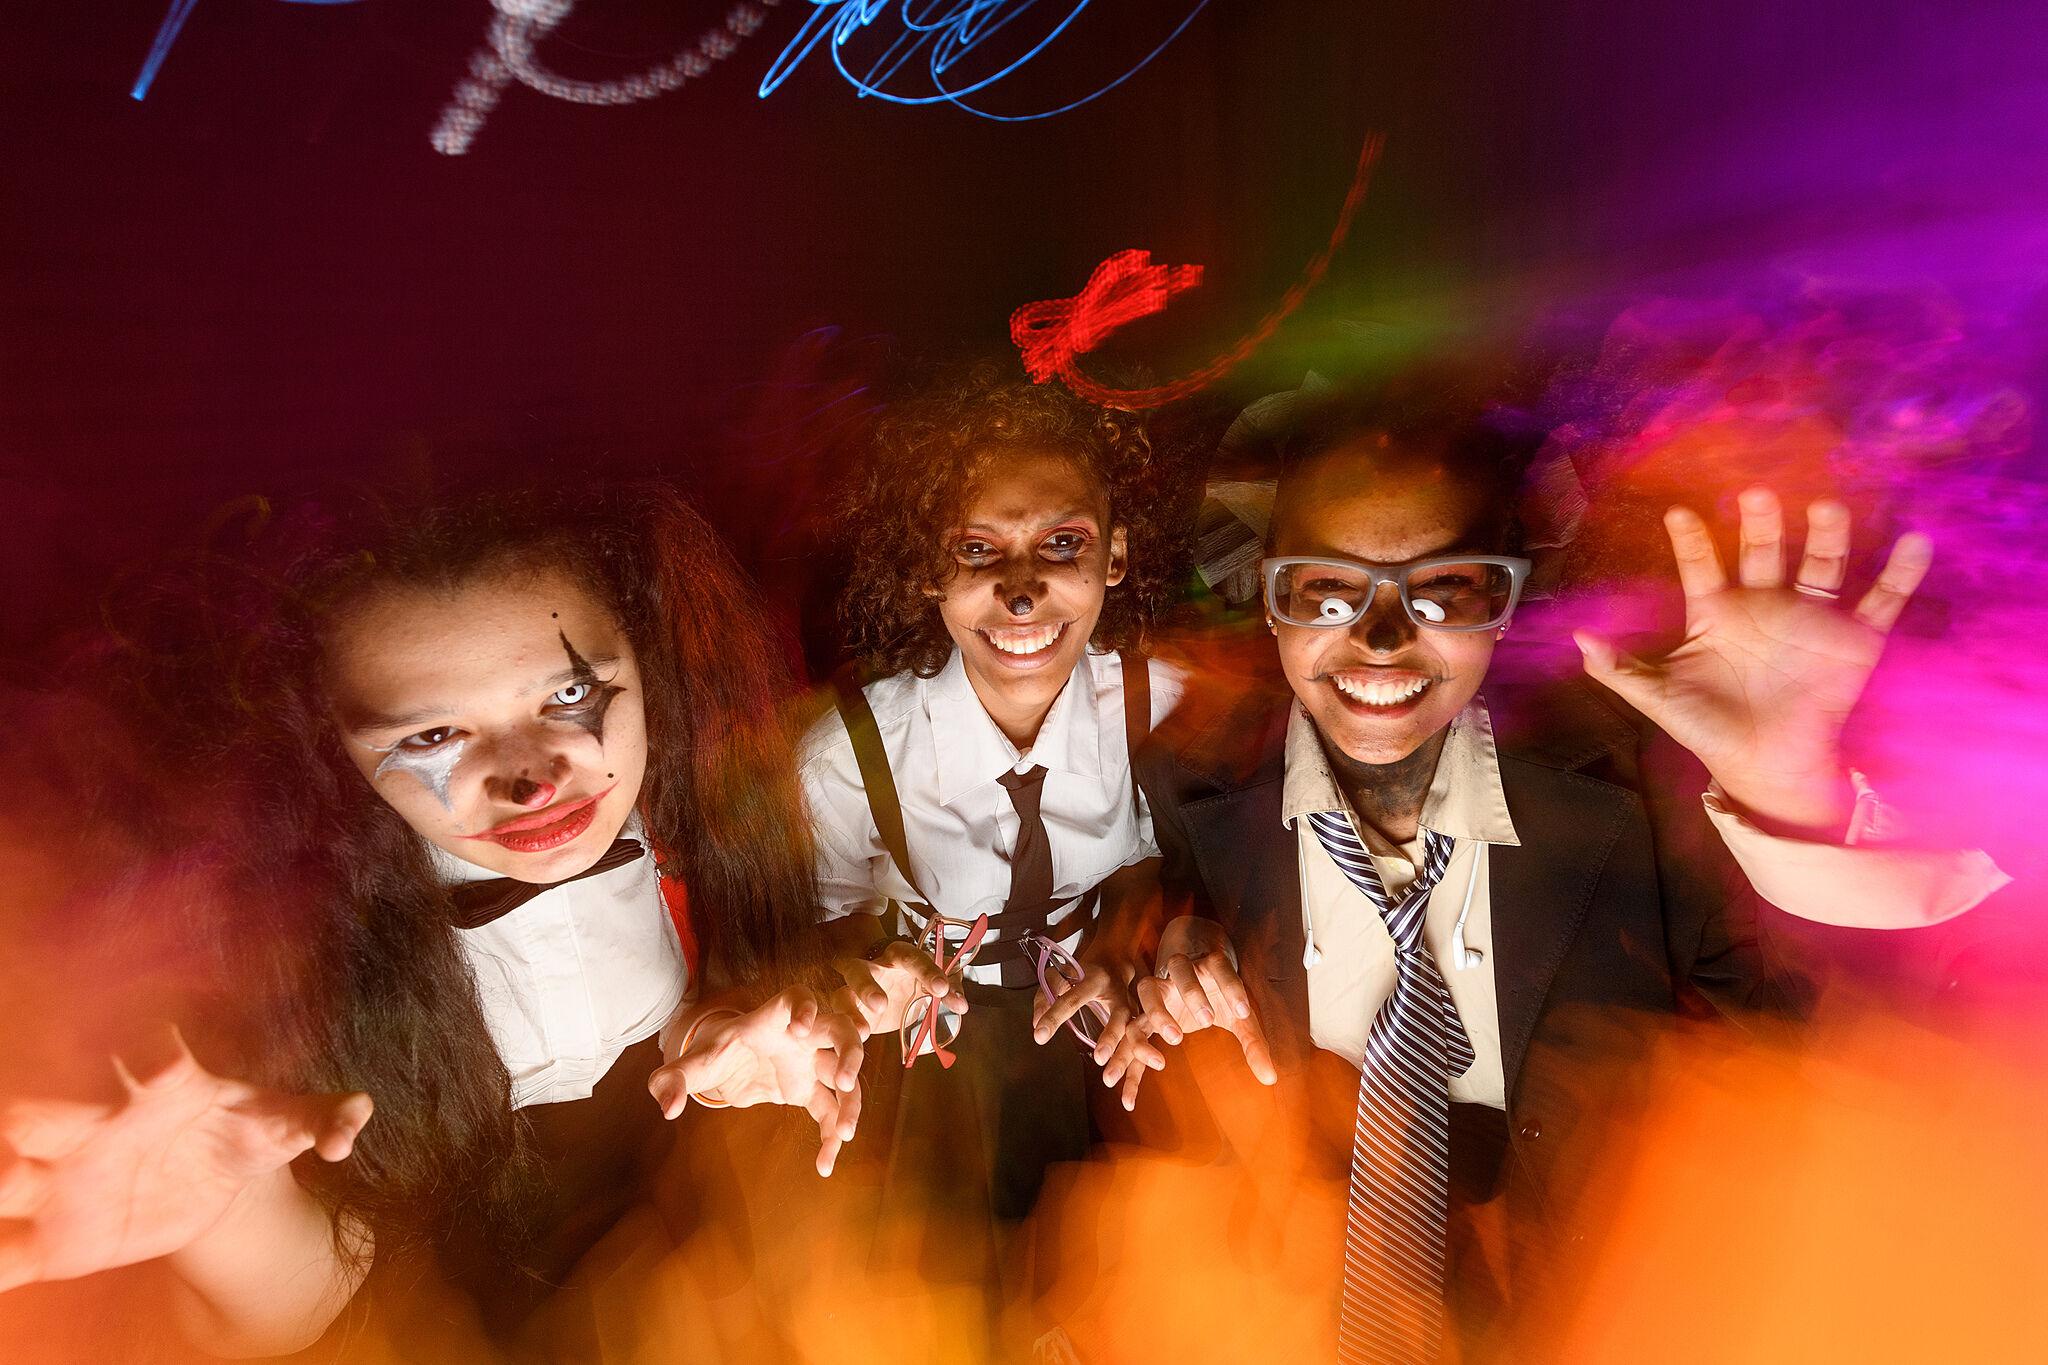 Teens in costume.